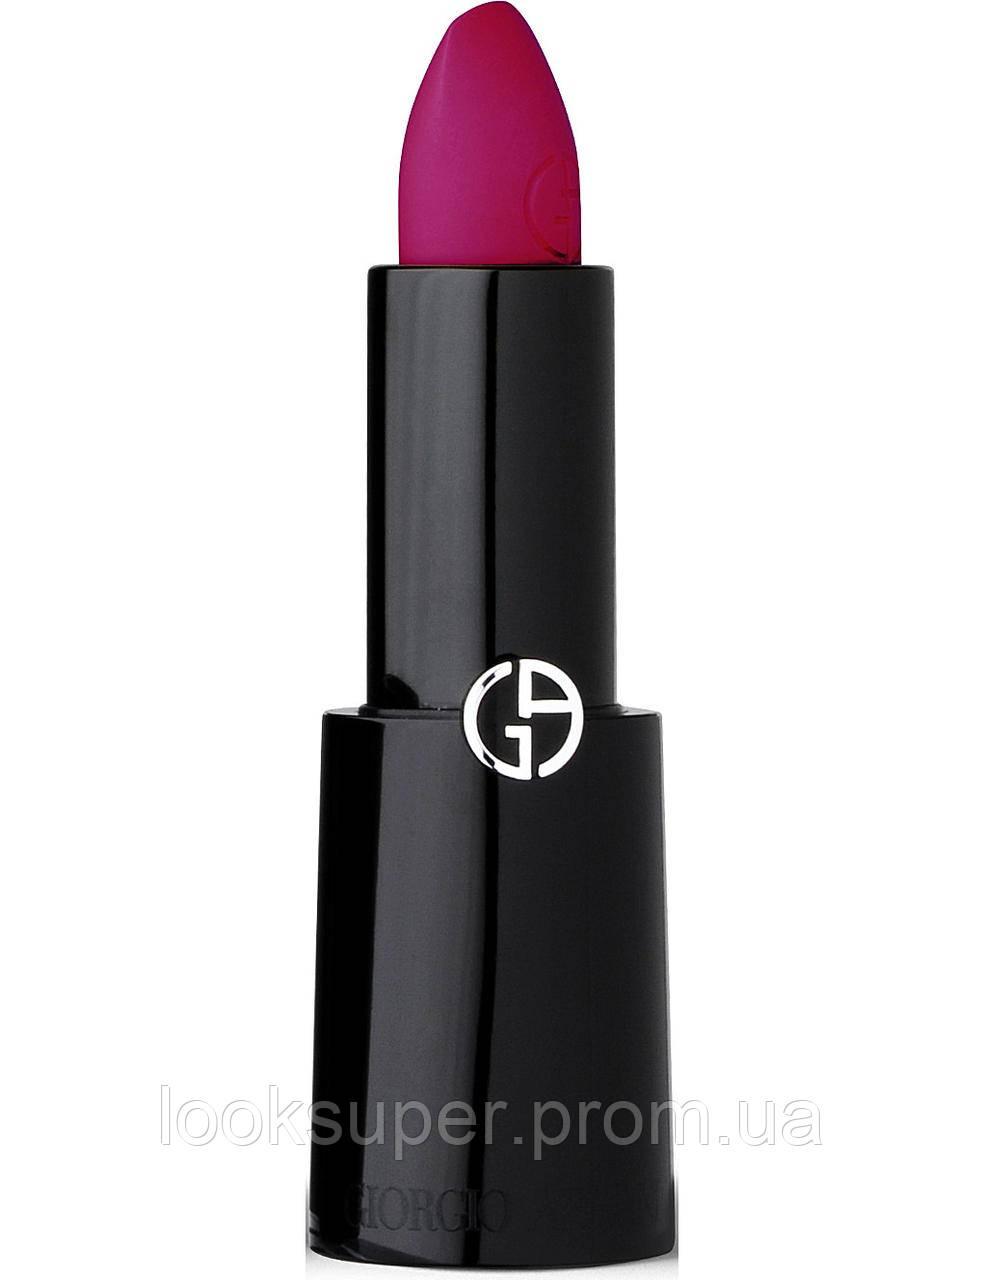 Губная помада GIORGIO ARMANI Rouge d'Armani lipstick Plum 600